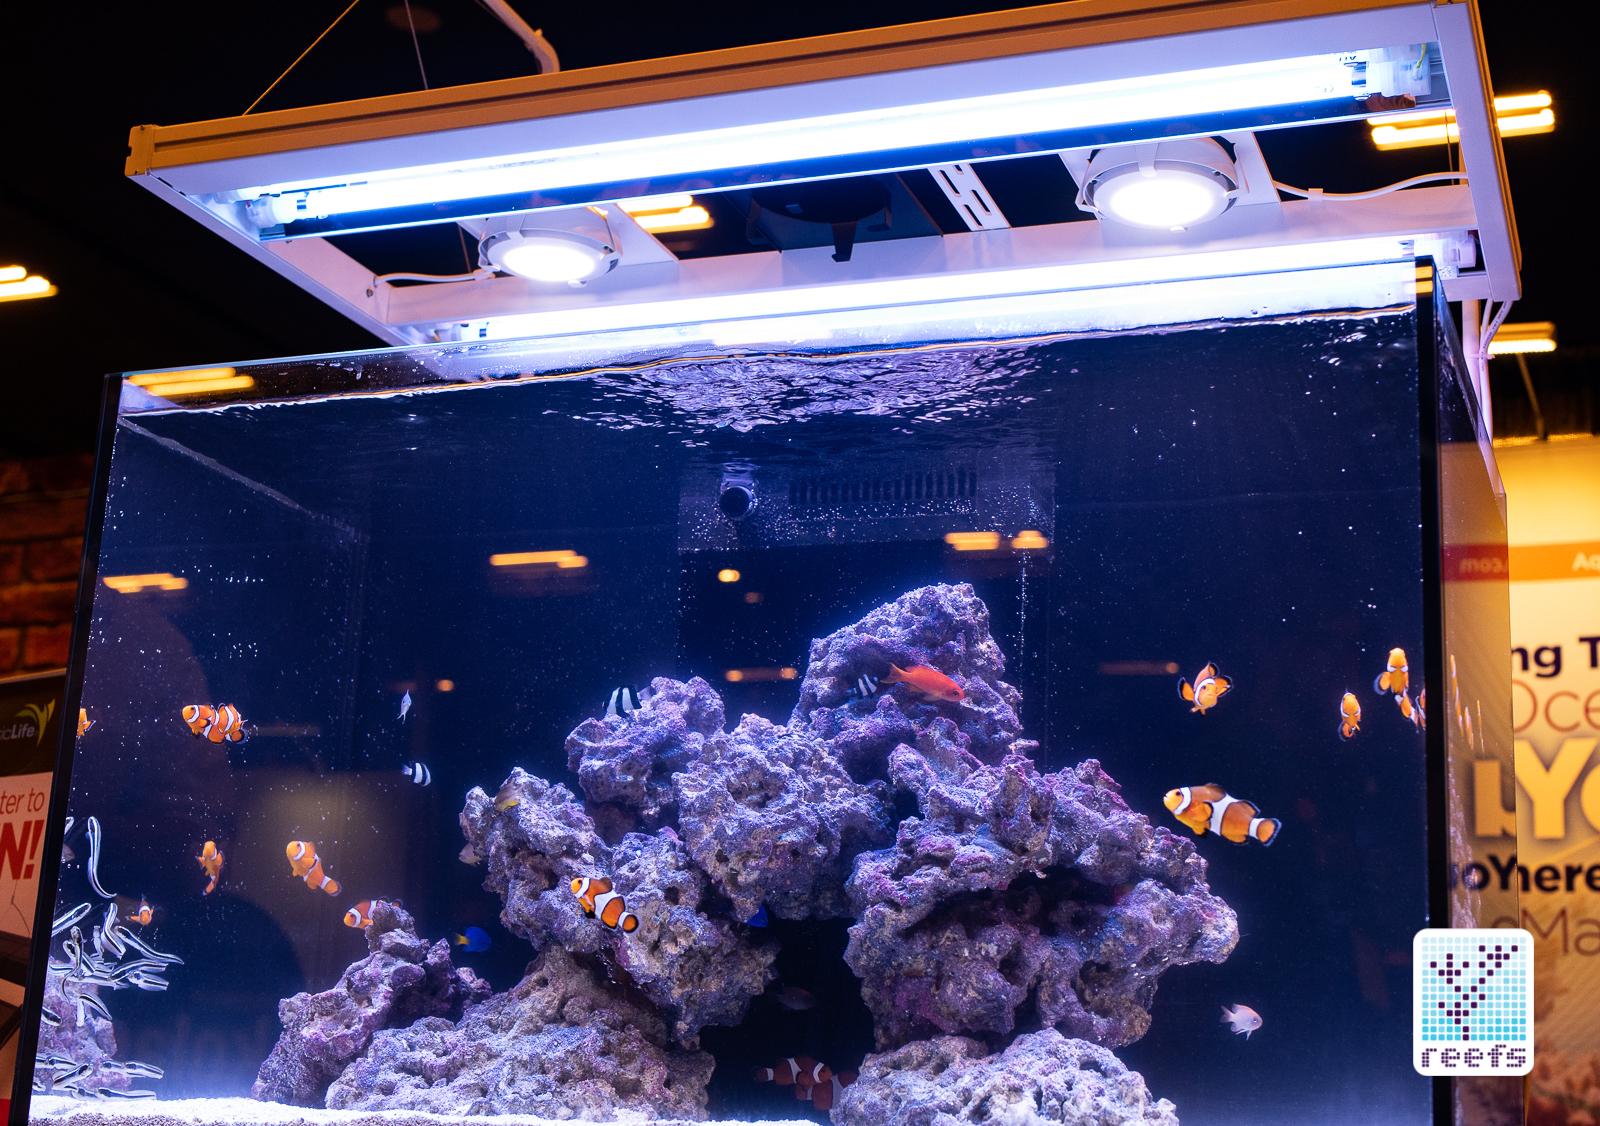 aquaticlife t5 hybrid light fixture the definitive review